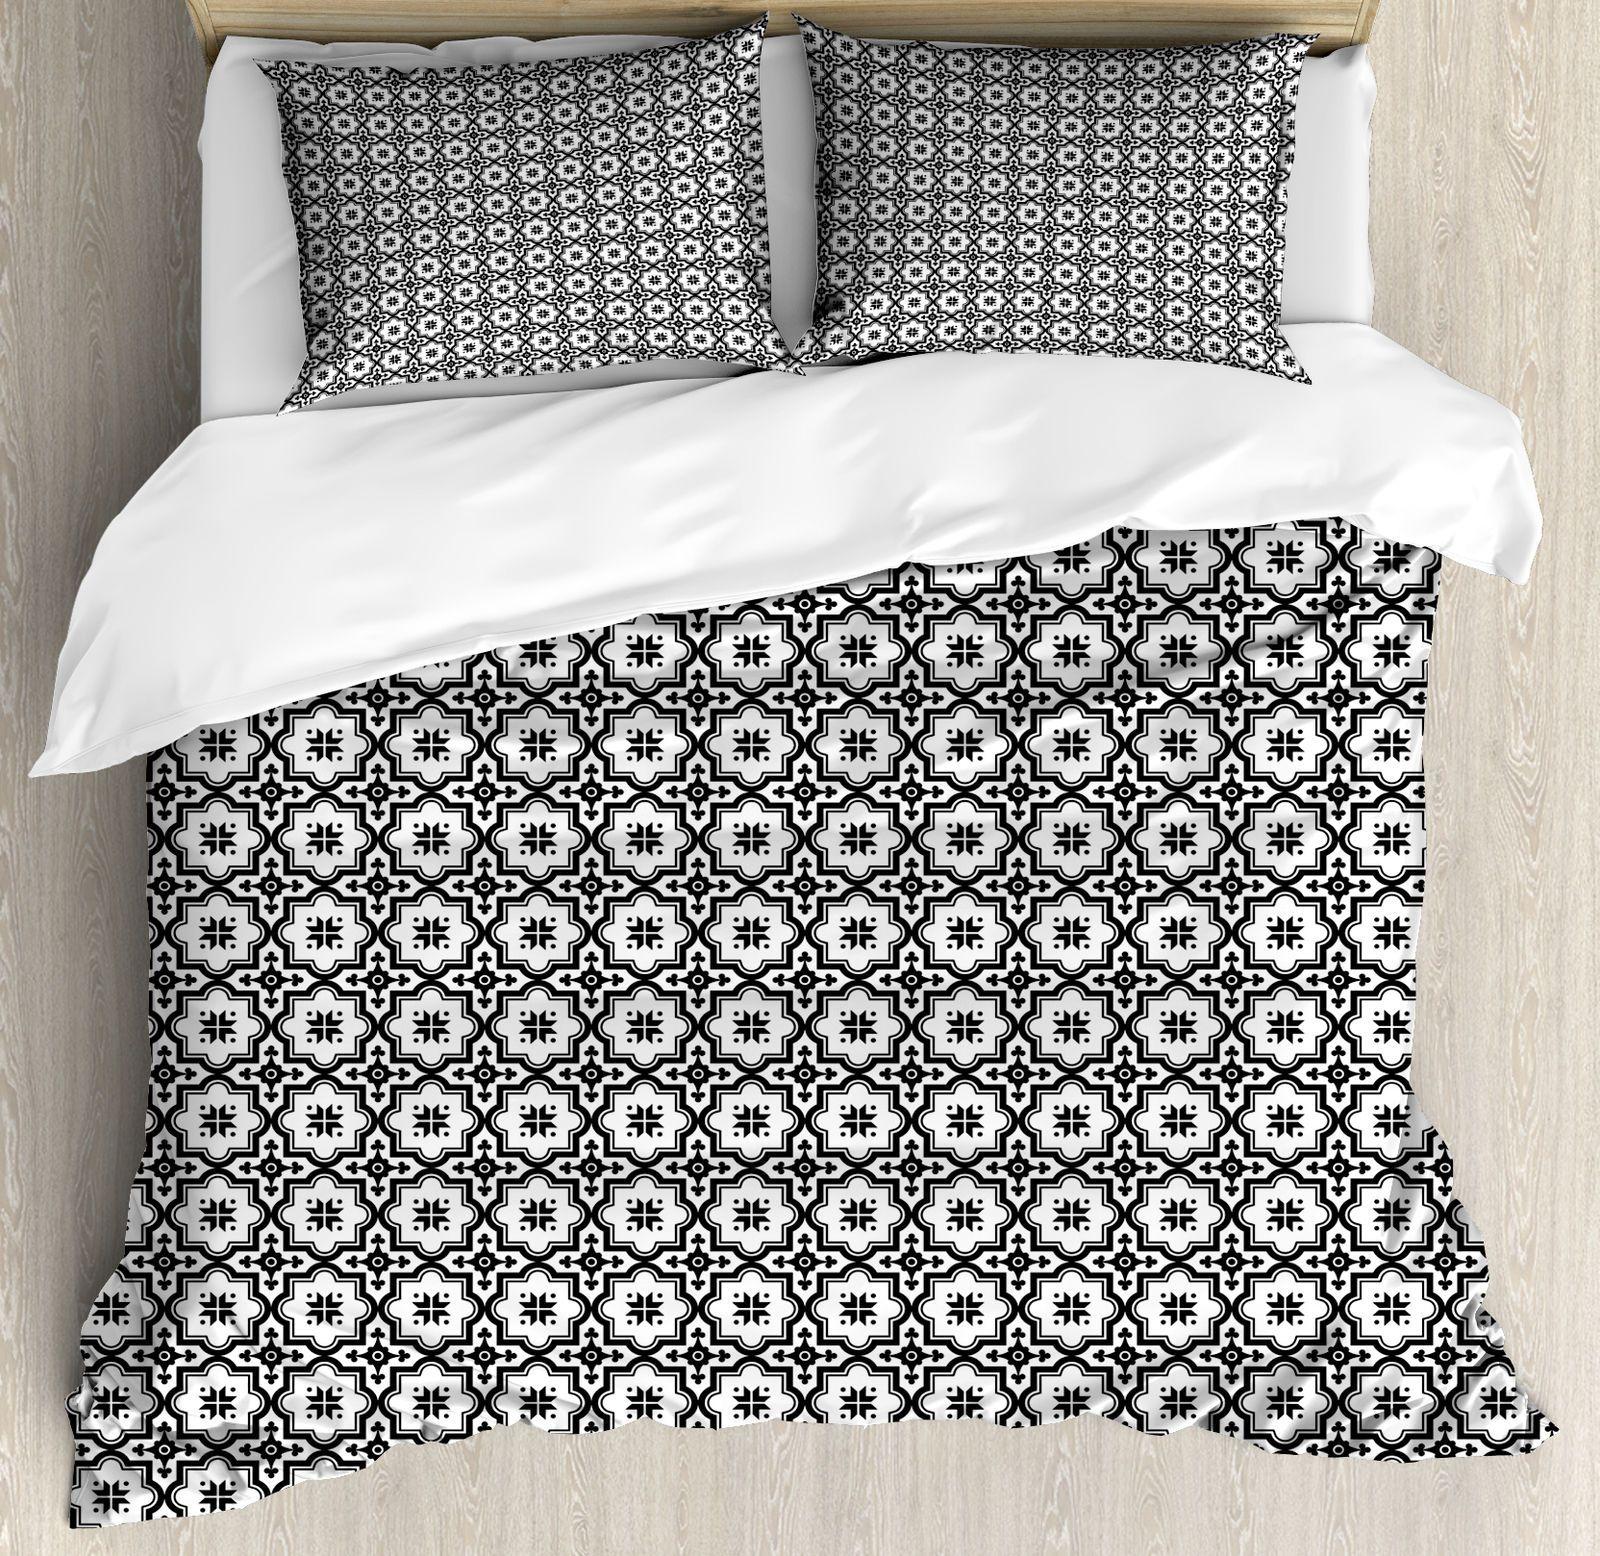 Moroccan Queen Size Duvet Cover Set Monochrome Tile Design With 2 Pillow Shams Ebay Duvet Cover Sets Queen Size Duvet Covers Tile Design